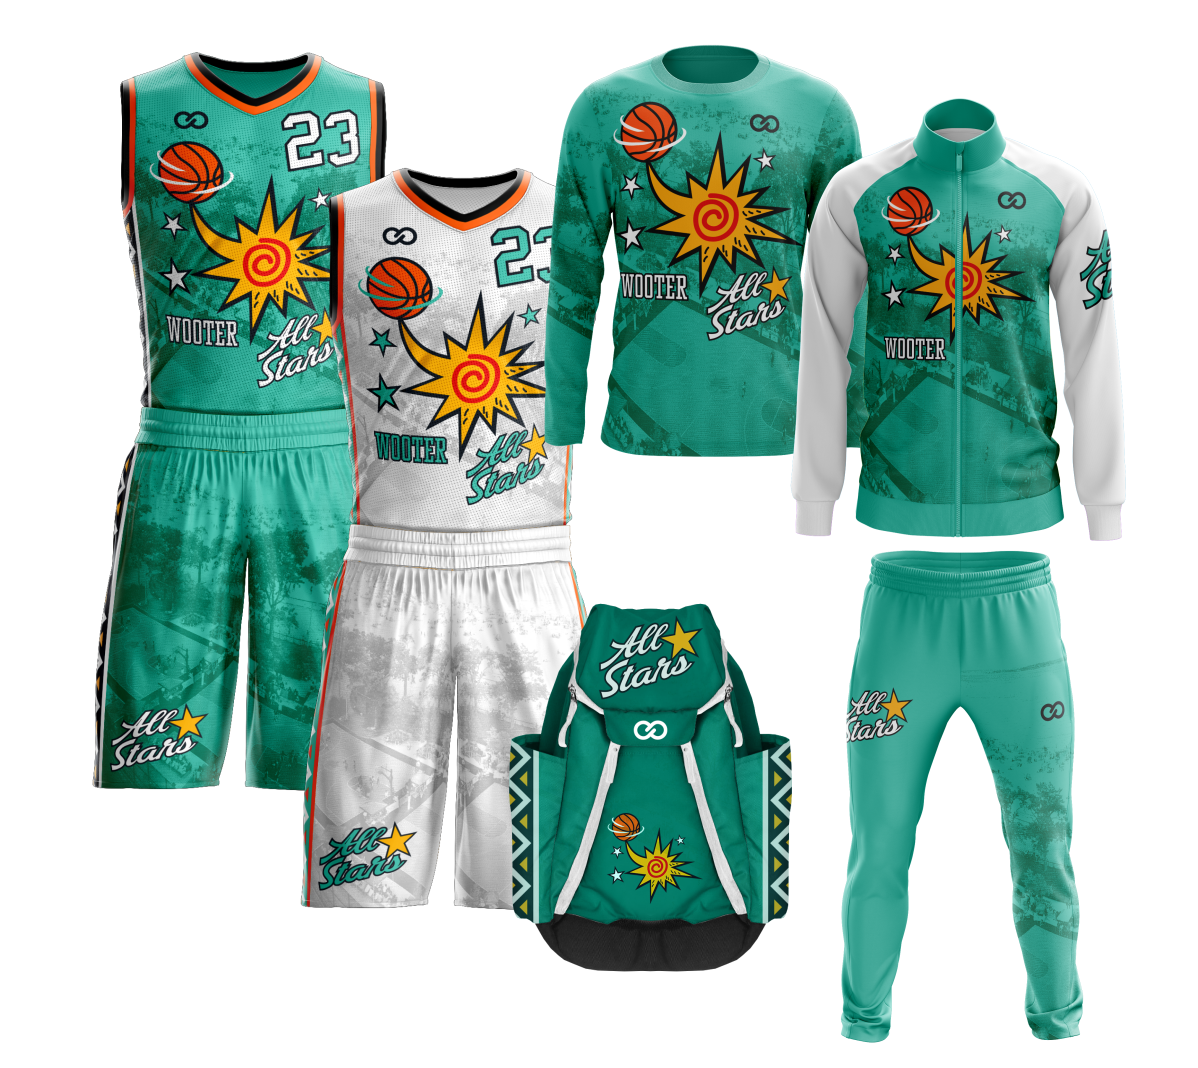 Basketball MVP Package